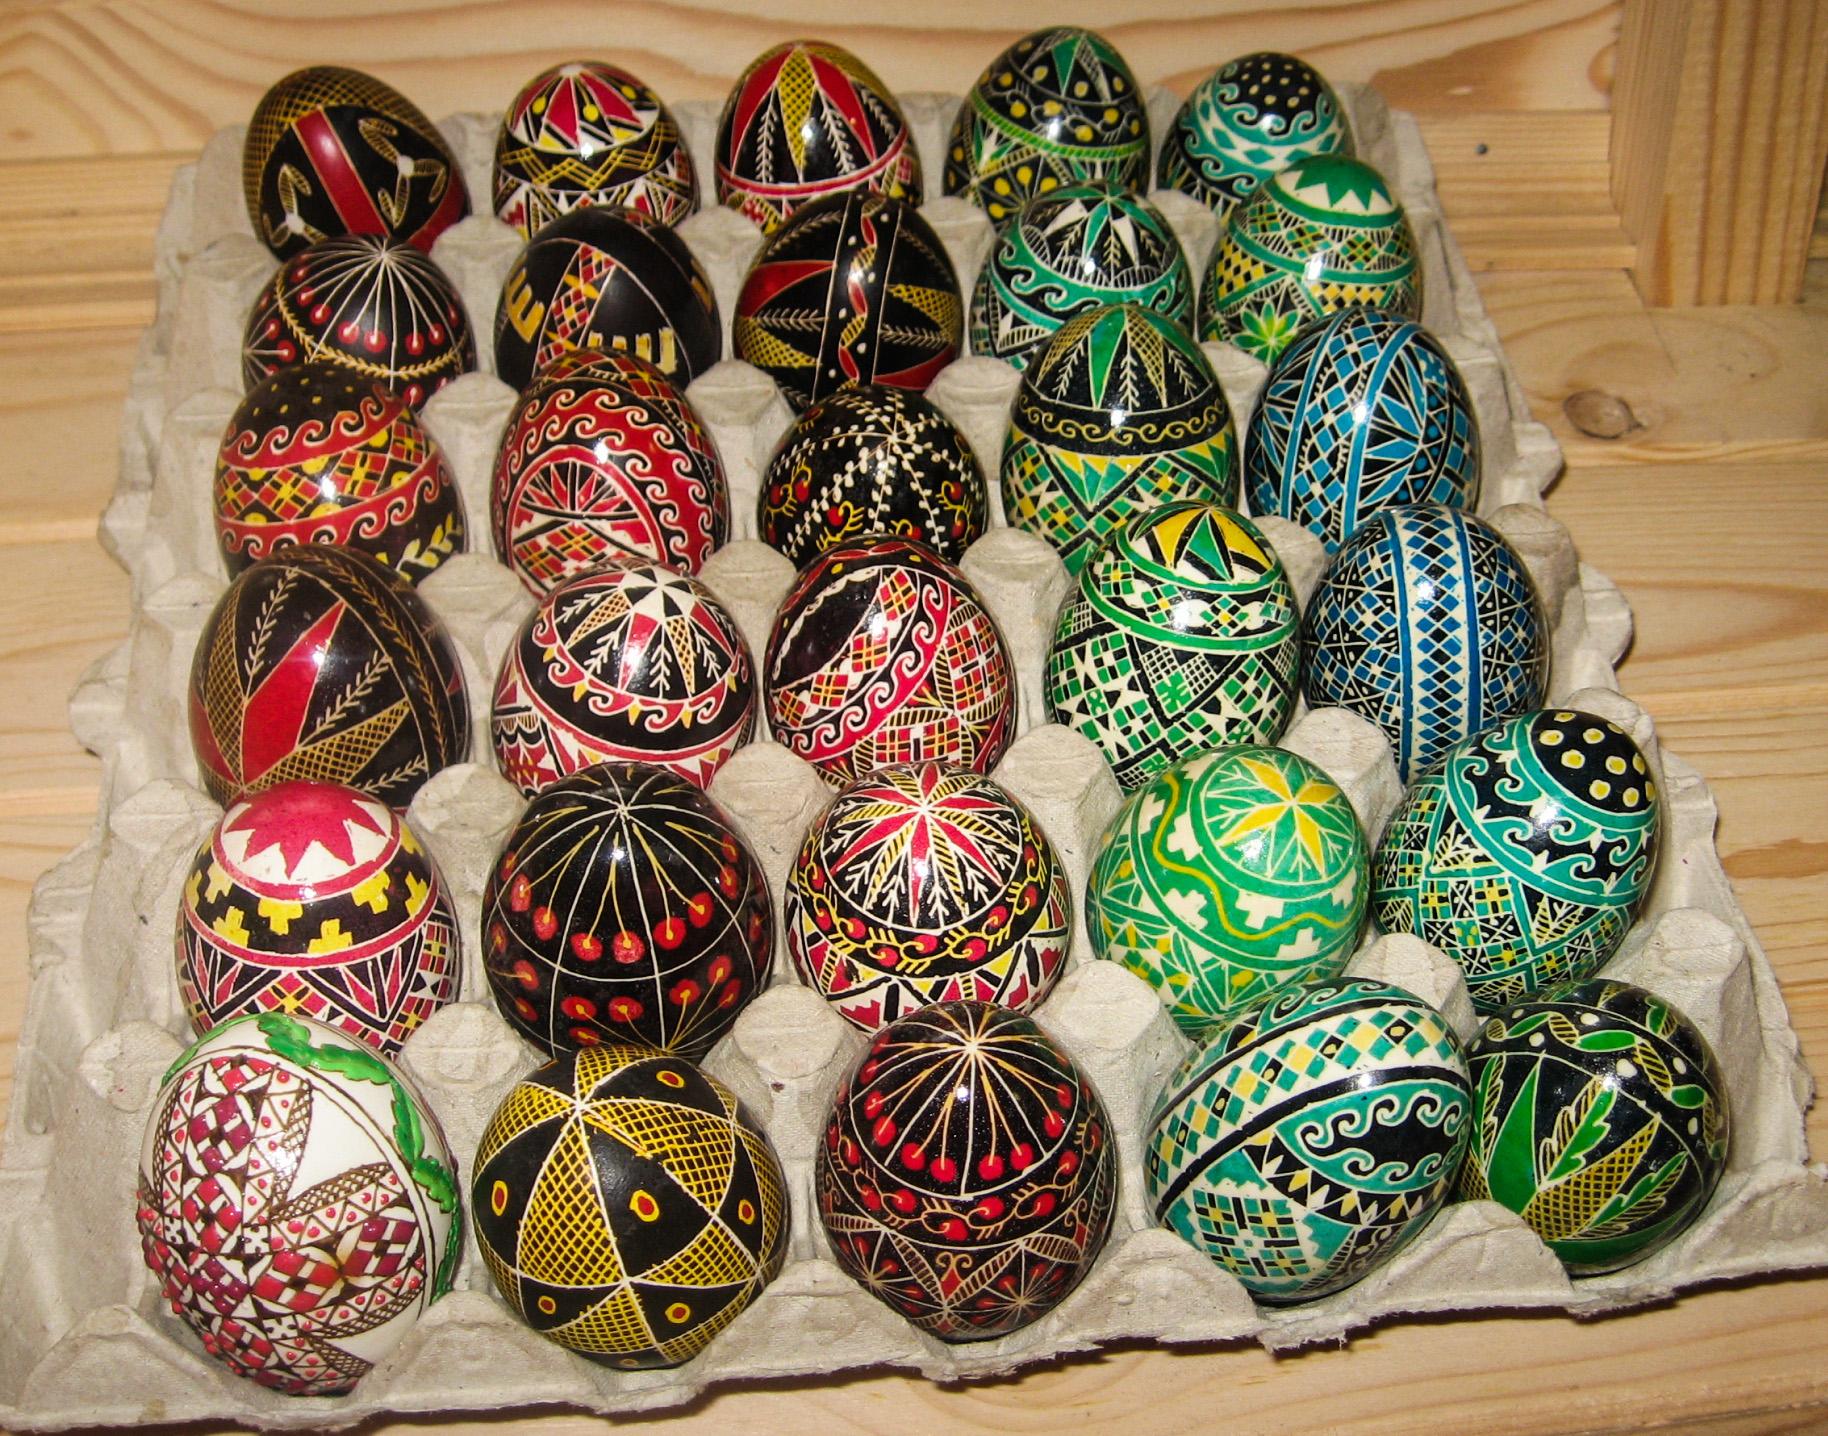 Oeufs peints en Roumanie